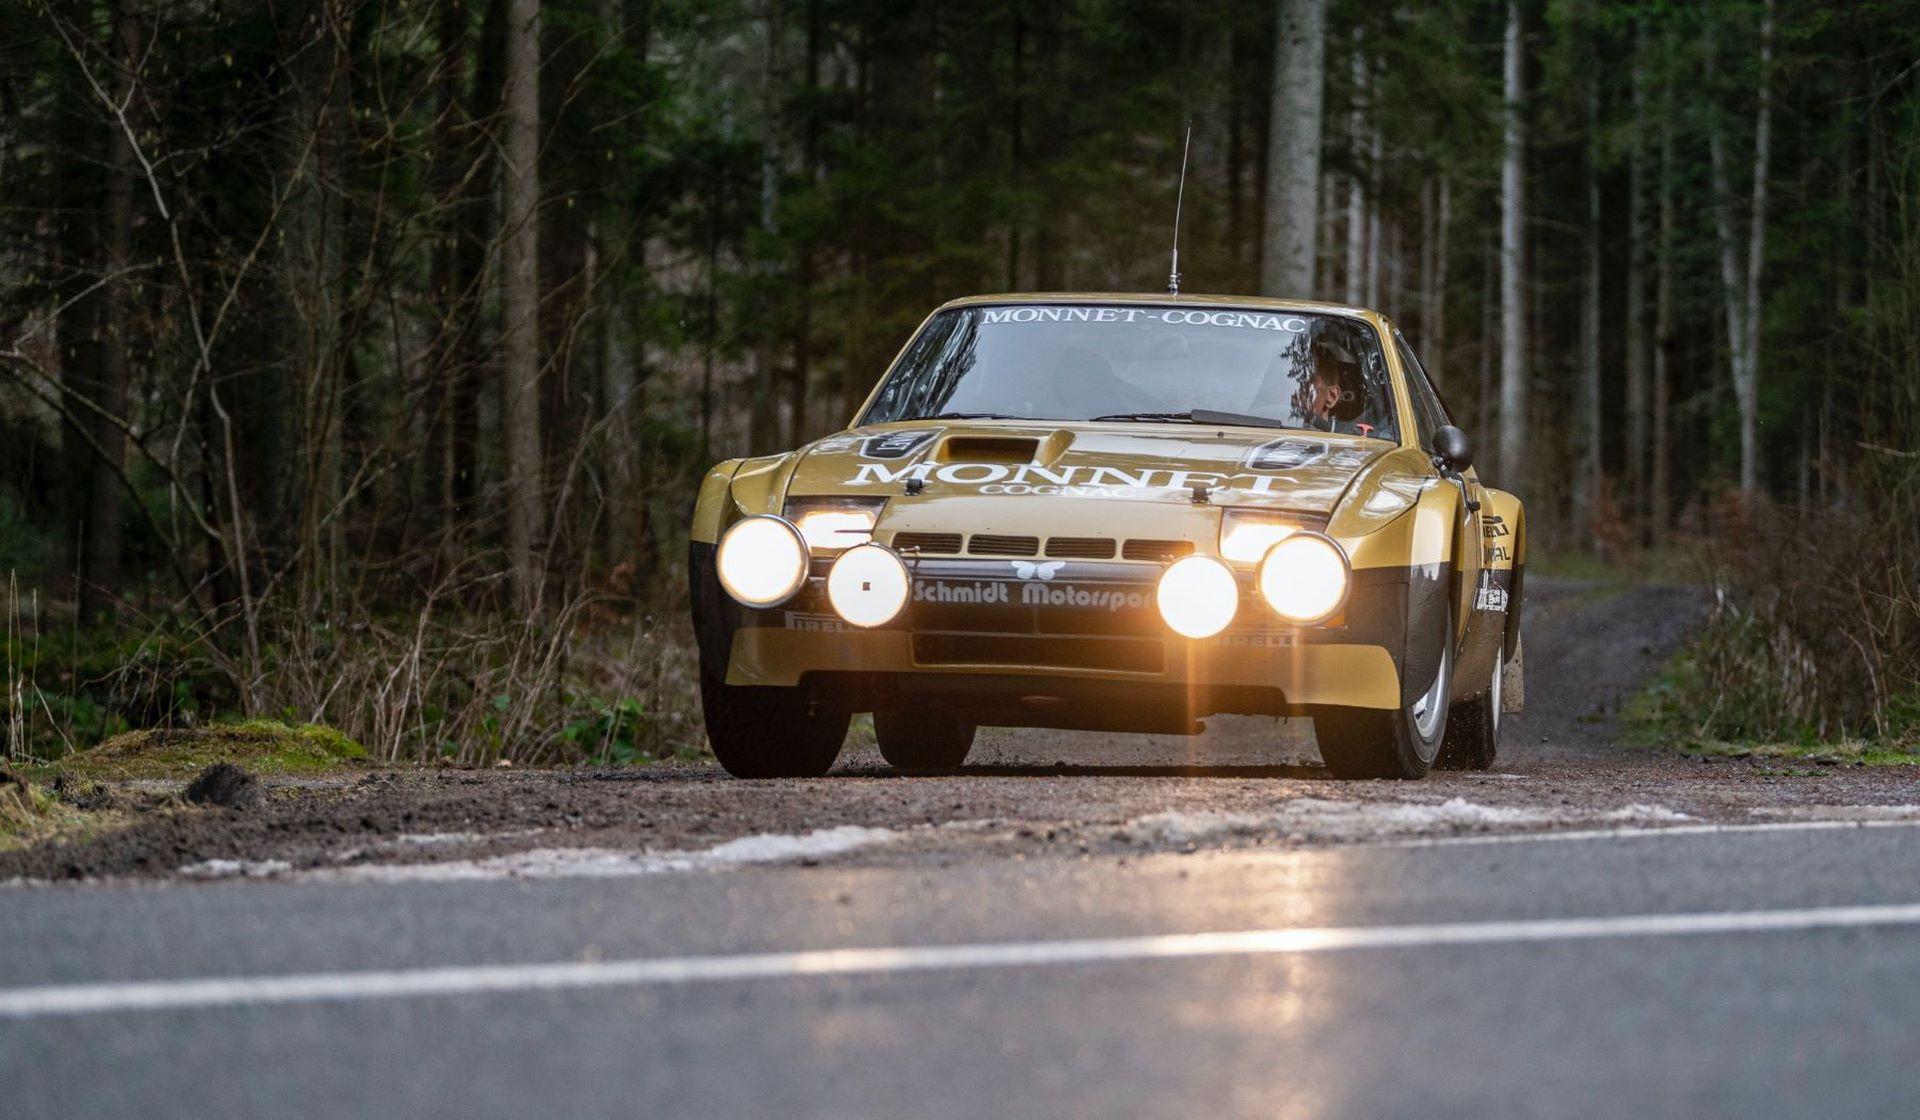 Porsche-924-Carrera-GTS-rally-car-Walter-Rohrl-4